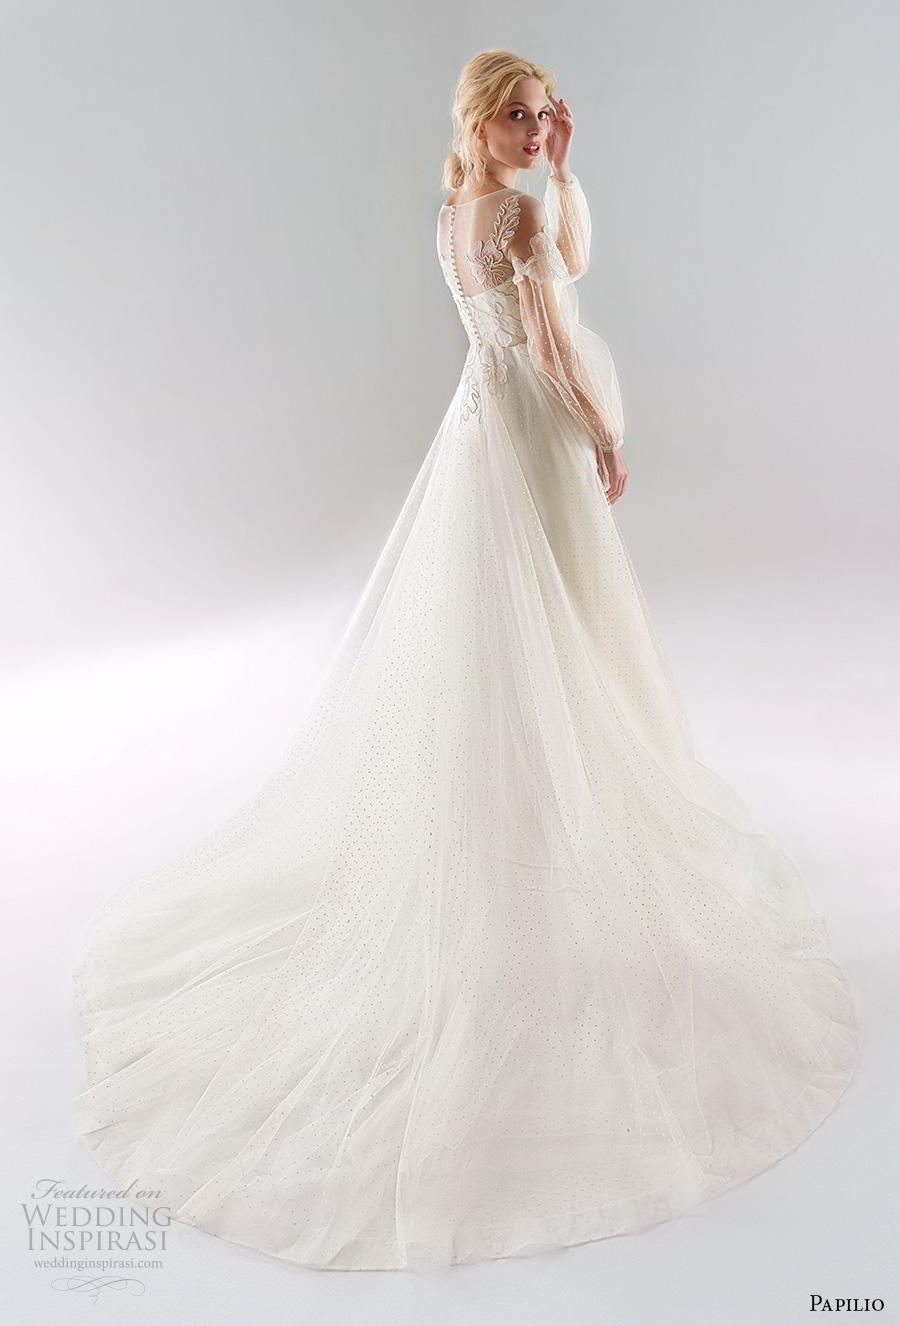 Papilio wedding dresses u ucwhite windud bridal collection in